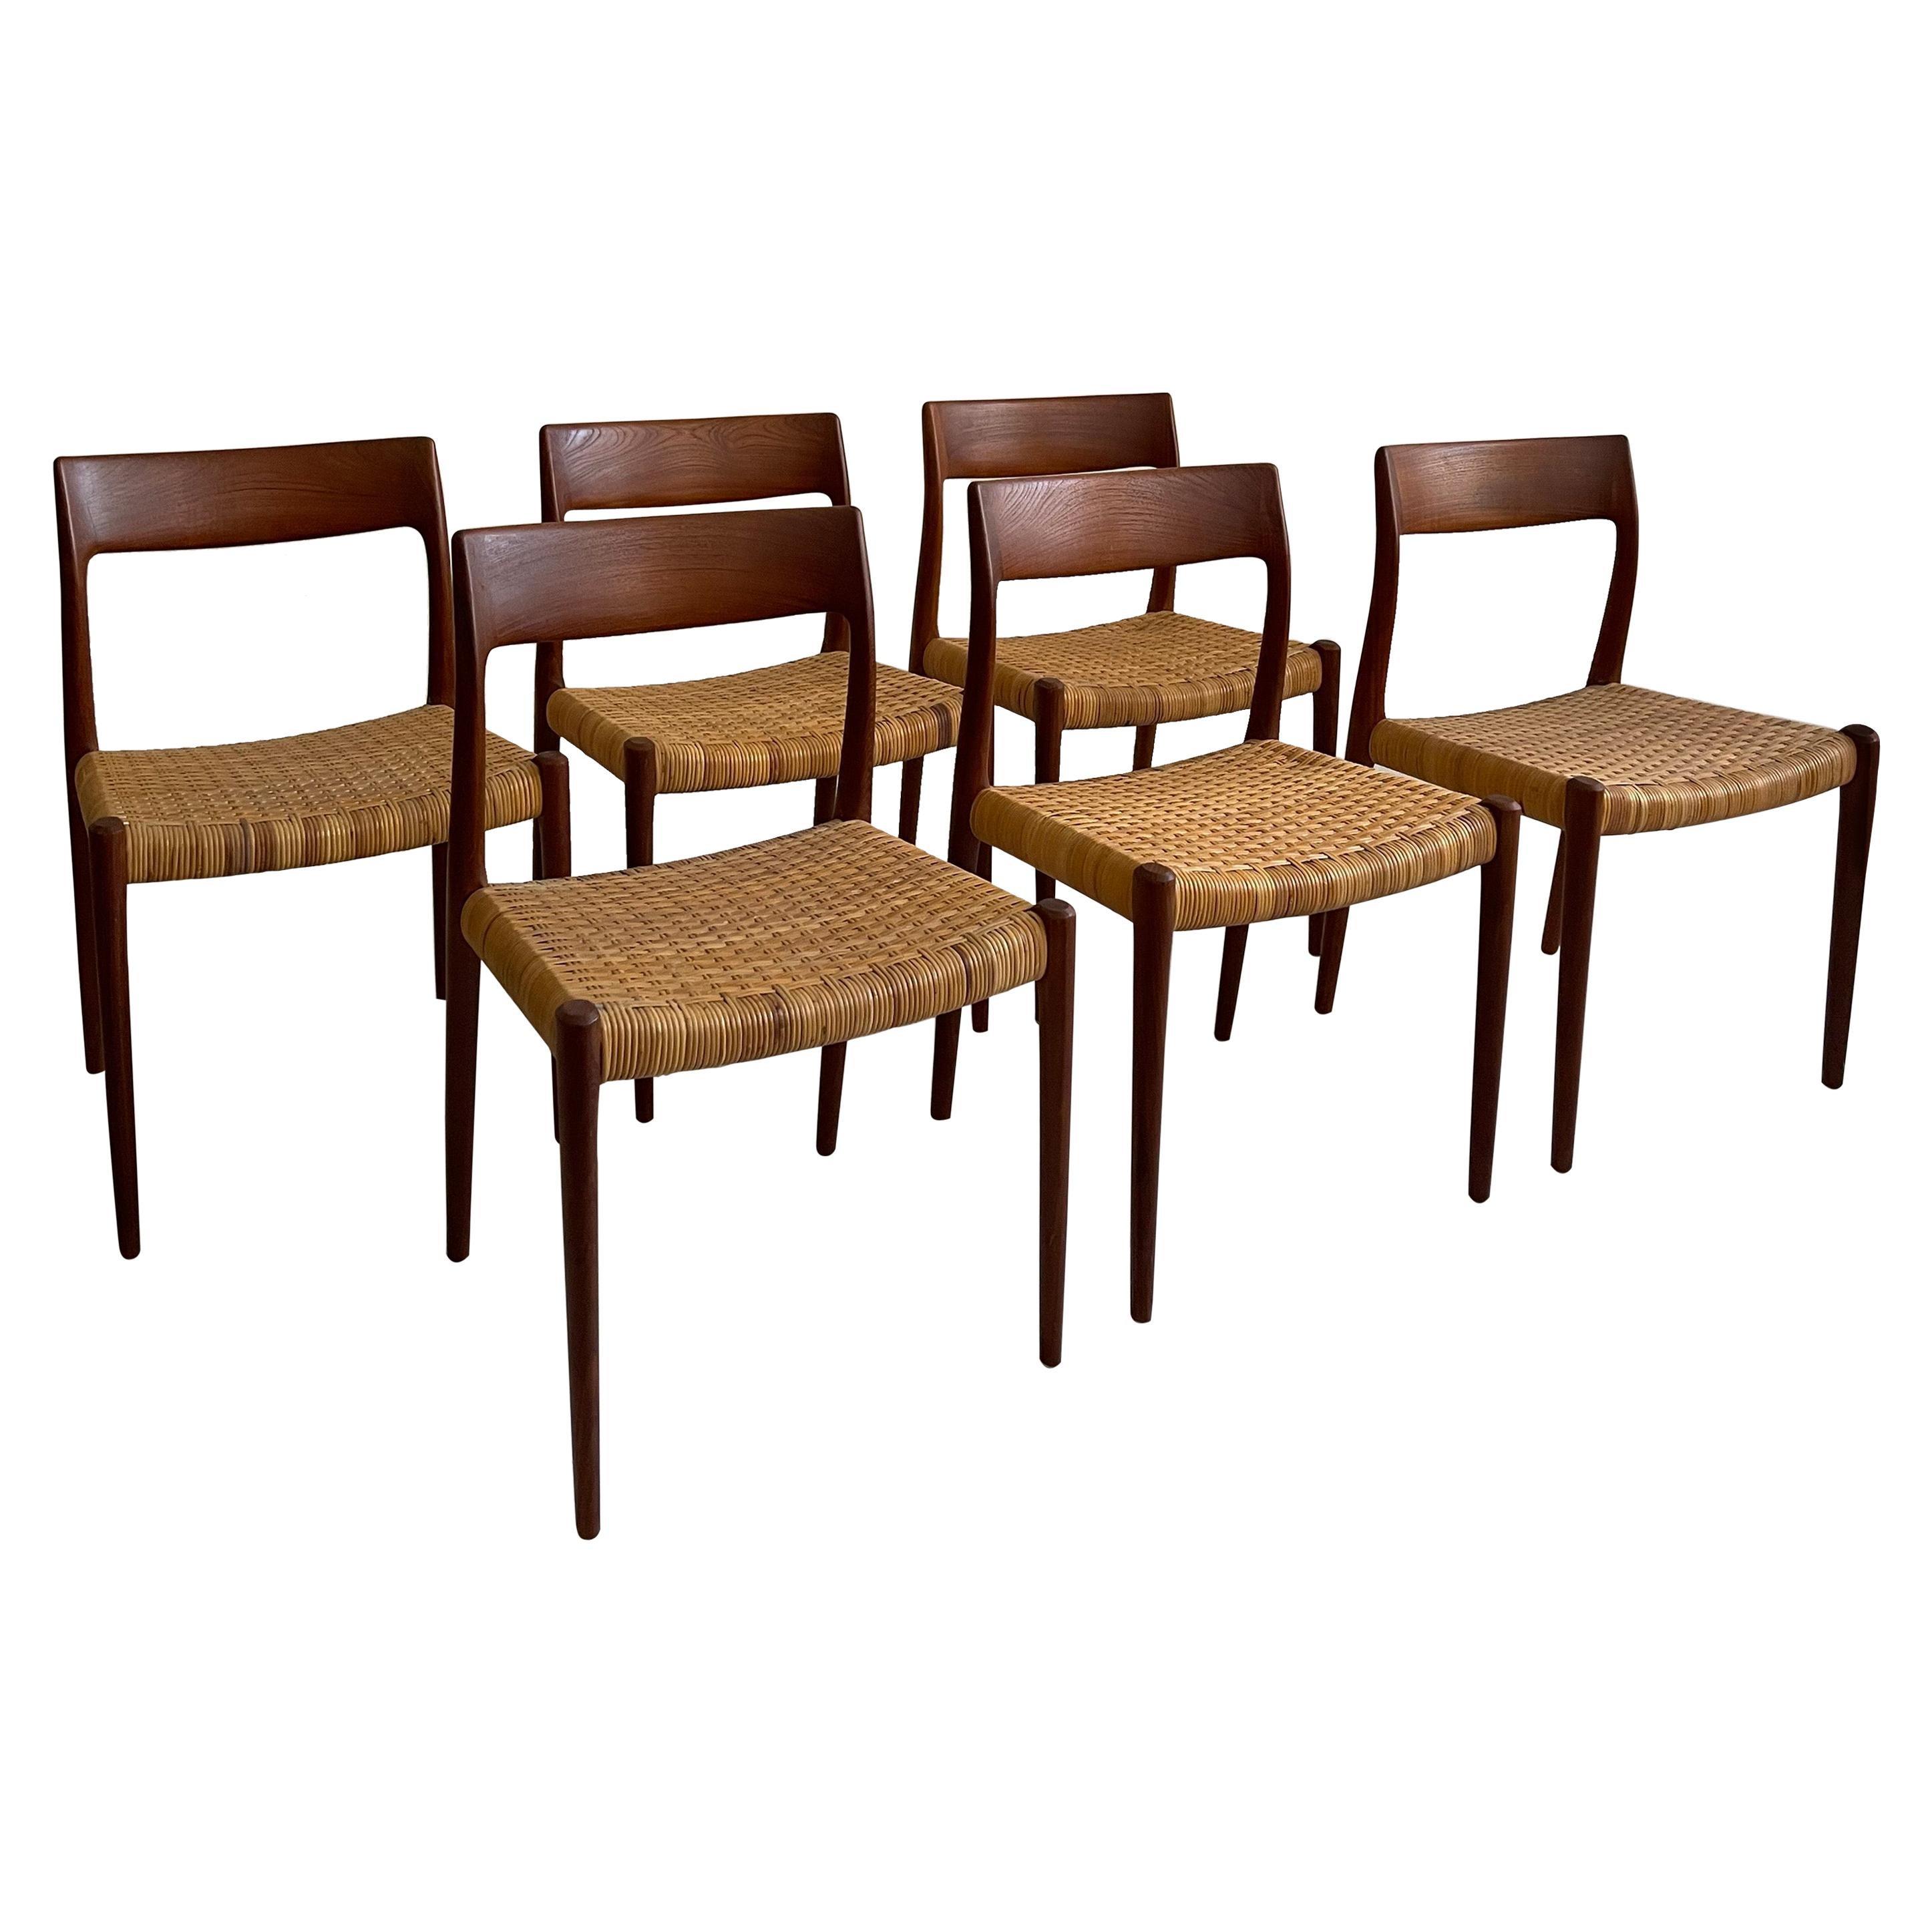 Model 57 Chair